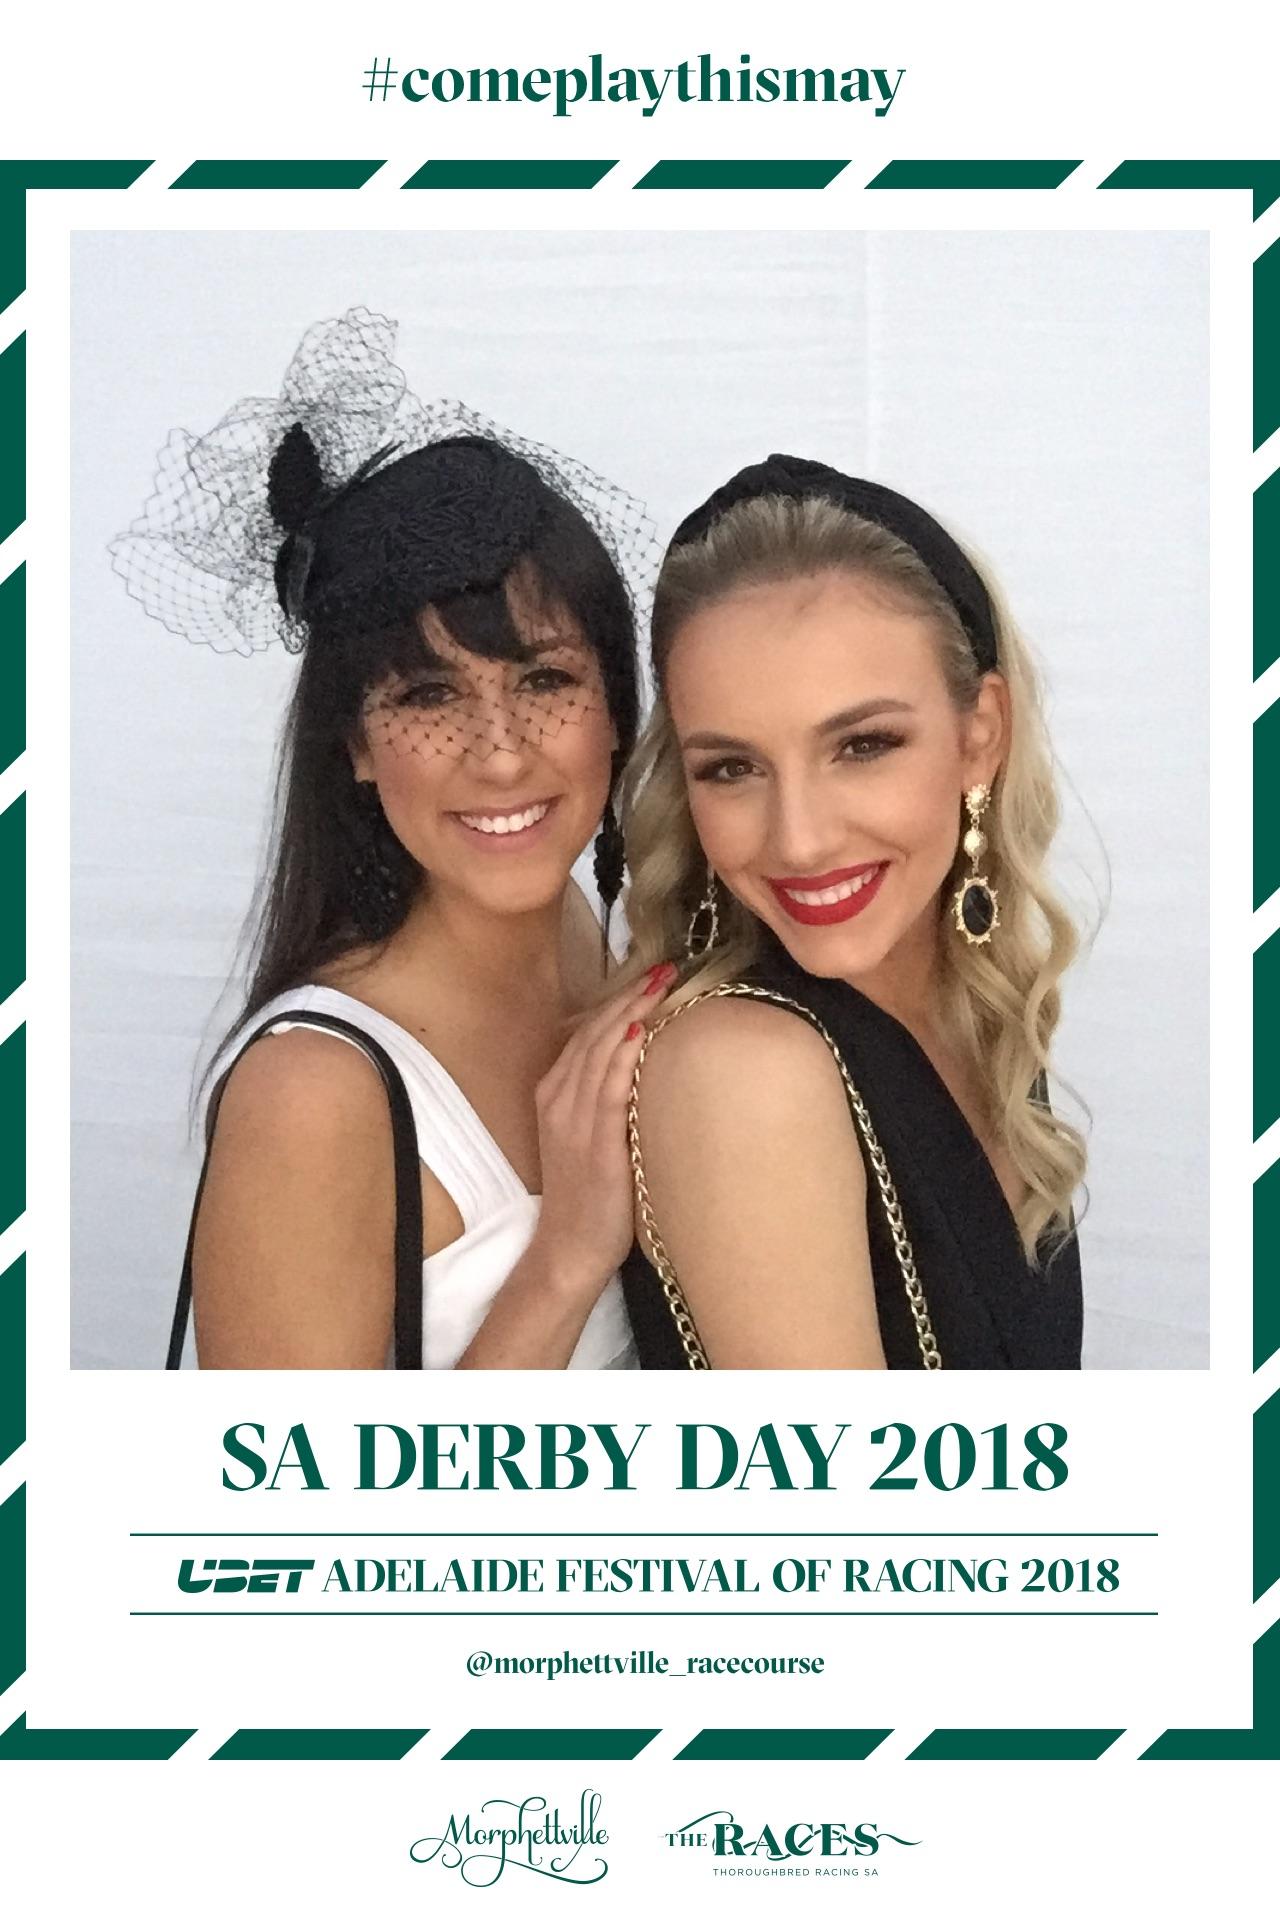 SA DERBY DAY 2018